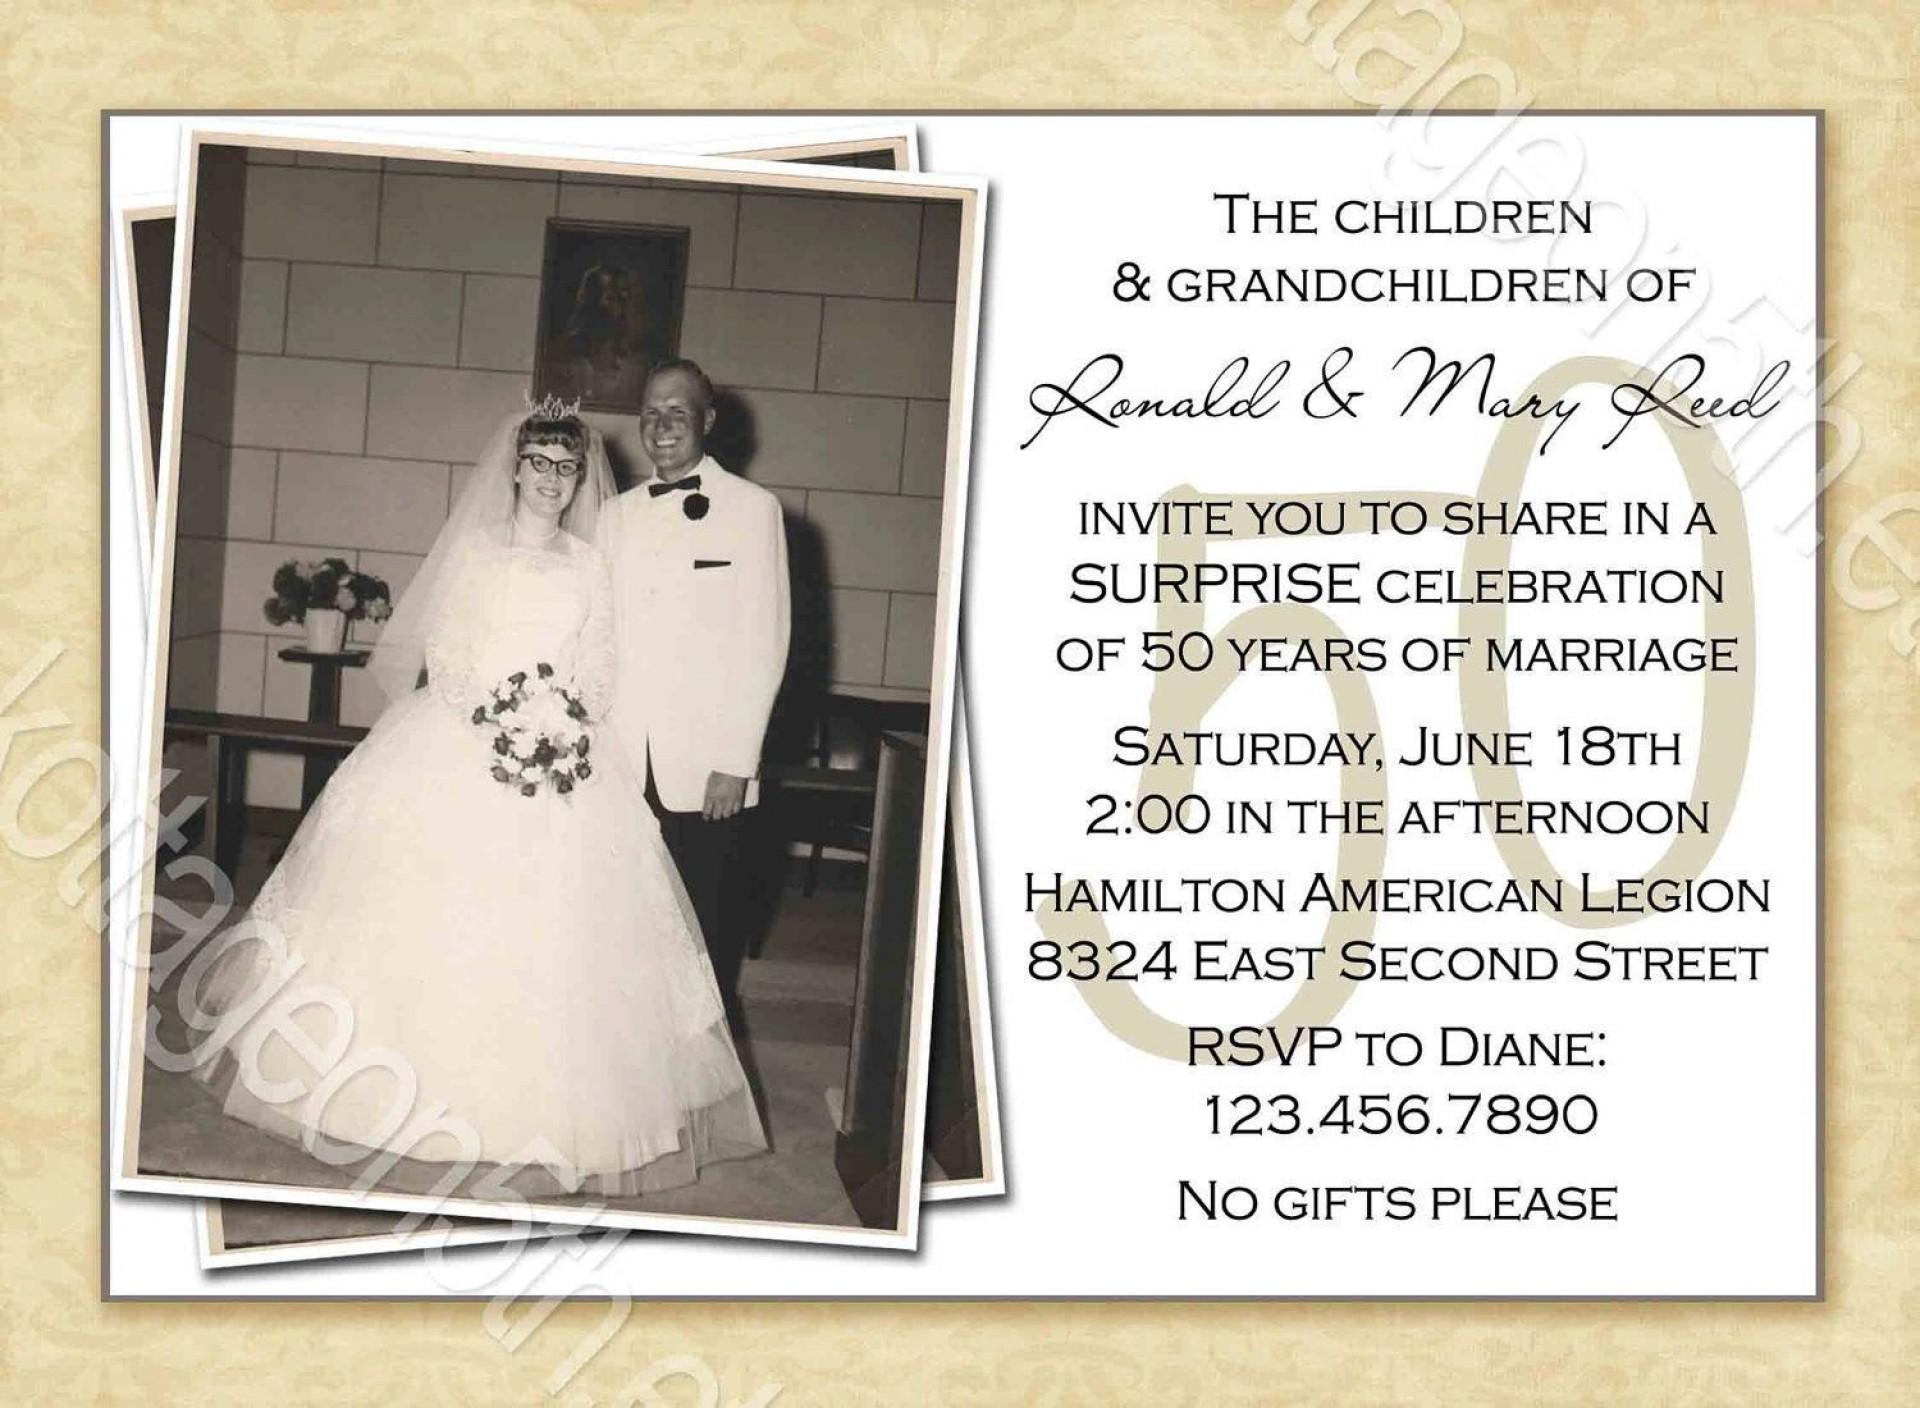 001 Magnificent 50th Anniversary Invitation Template Free Idea  Download Golden Wedding1920